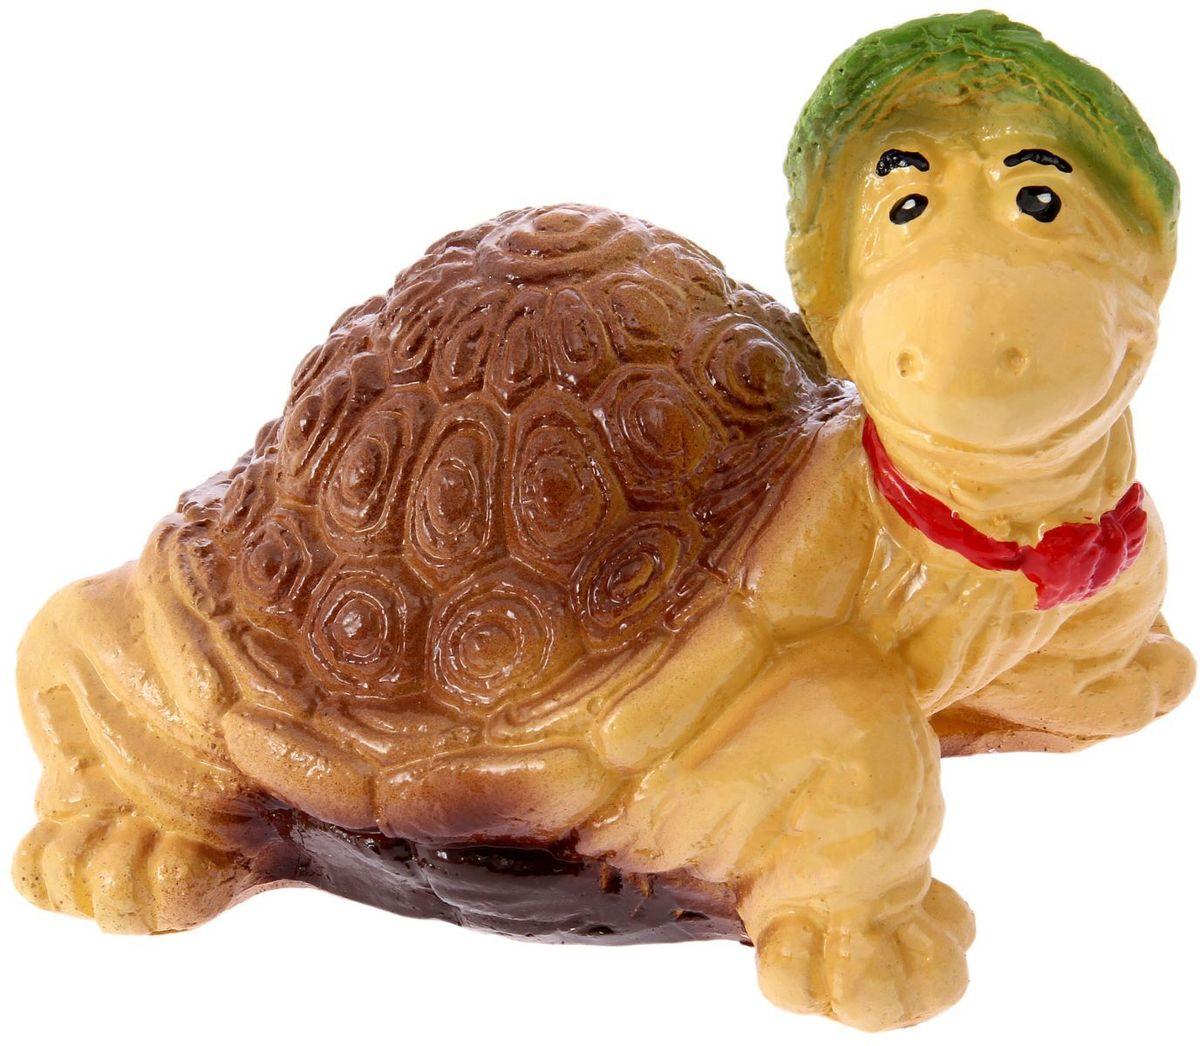 Фигура садовая Черепаха Тортила, 17 х 20 х 25 см1204029